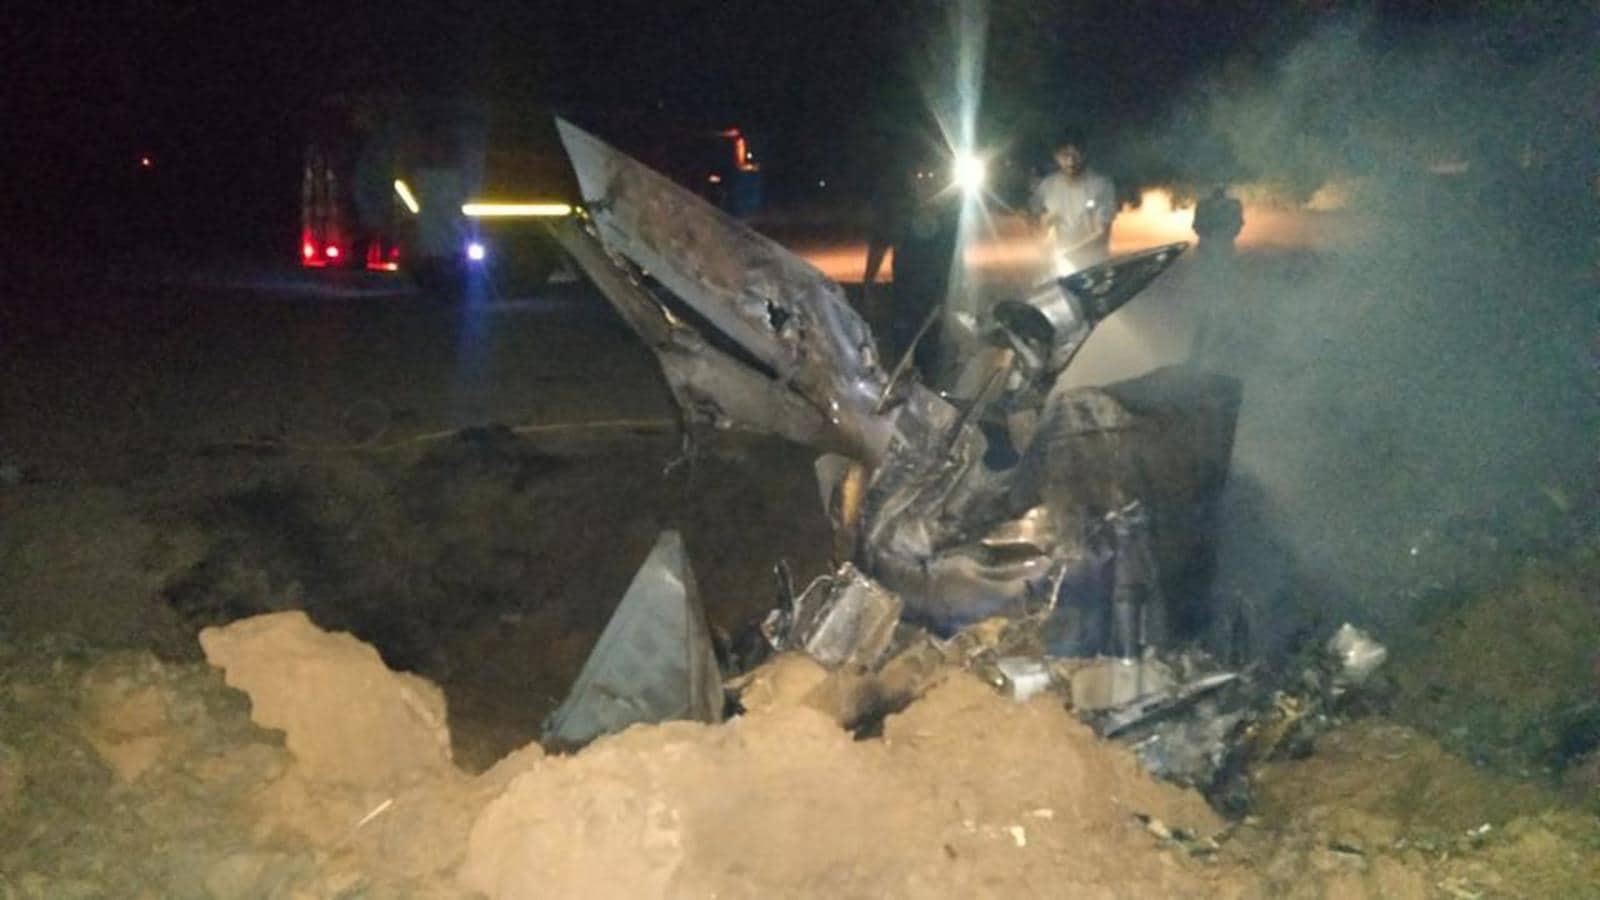 IAF pilot dies as MiG-21 crashes in Punjab's Moga district   Hindustan Times